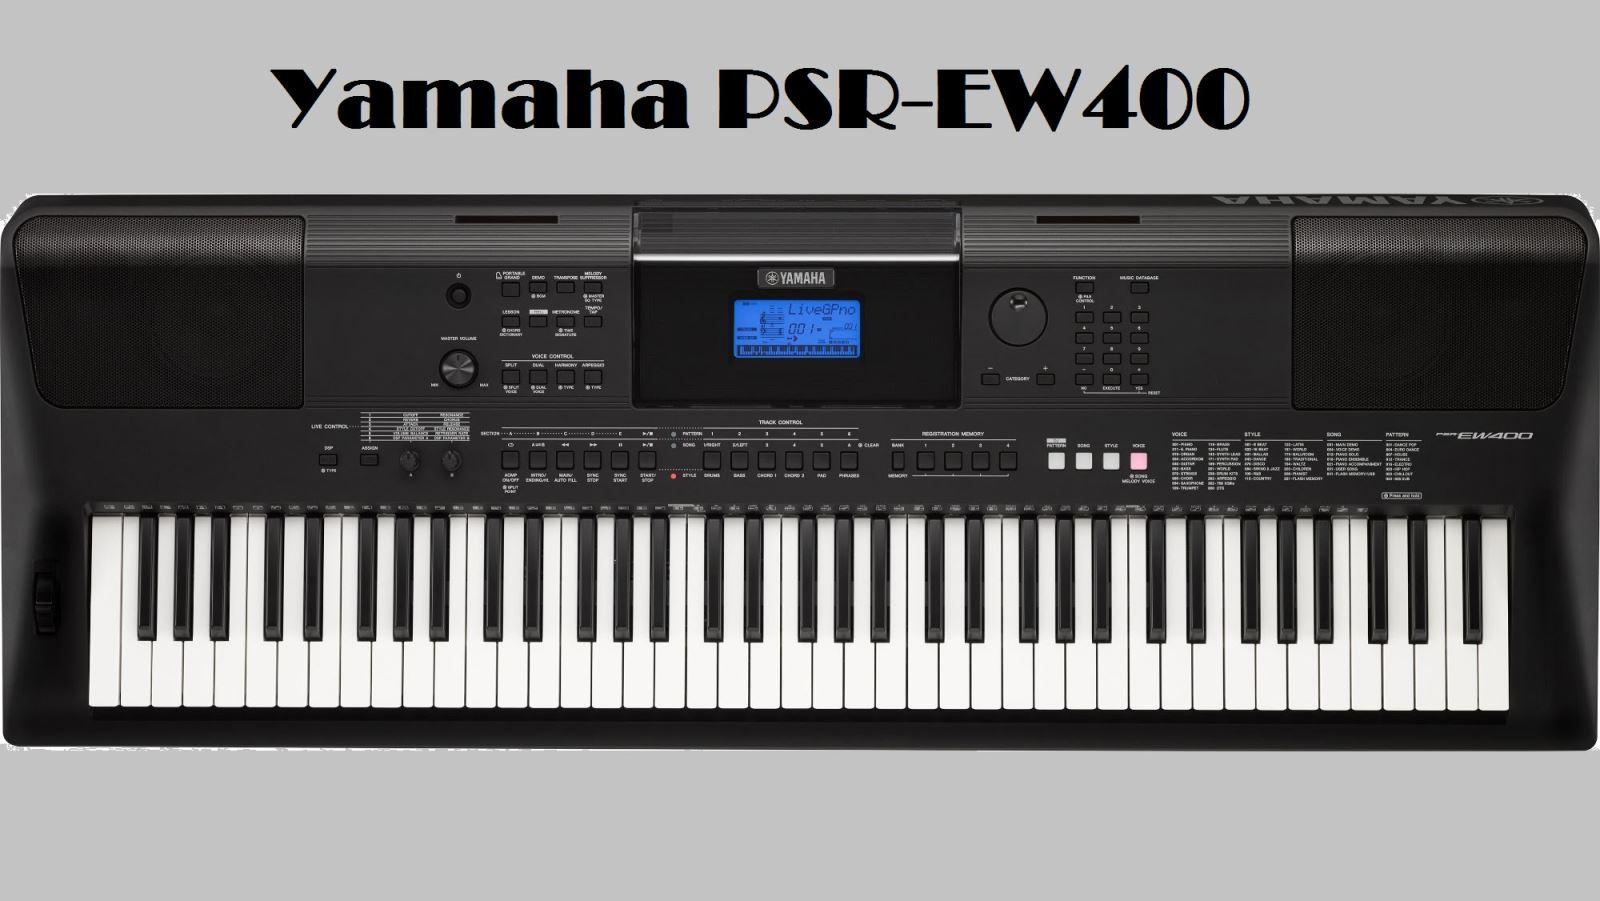 nh gi nhanh keyboard organ yamaha psr ew400 organ. Black Bedroom Furniture Sets. Home Design Ideas